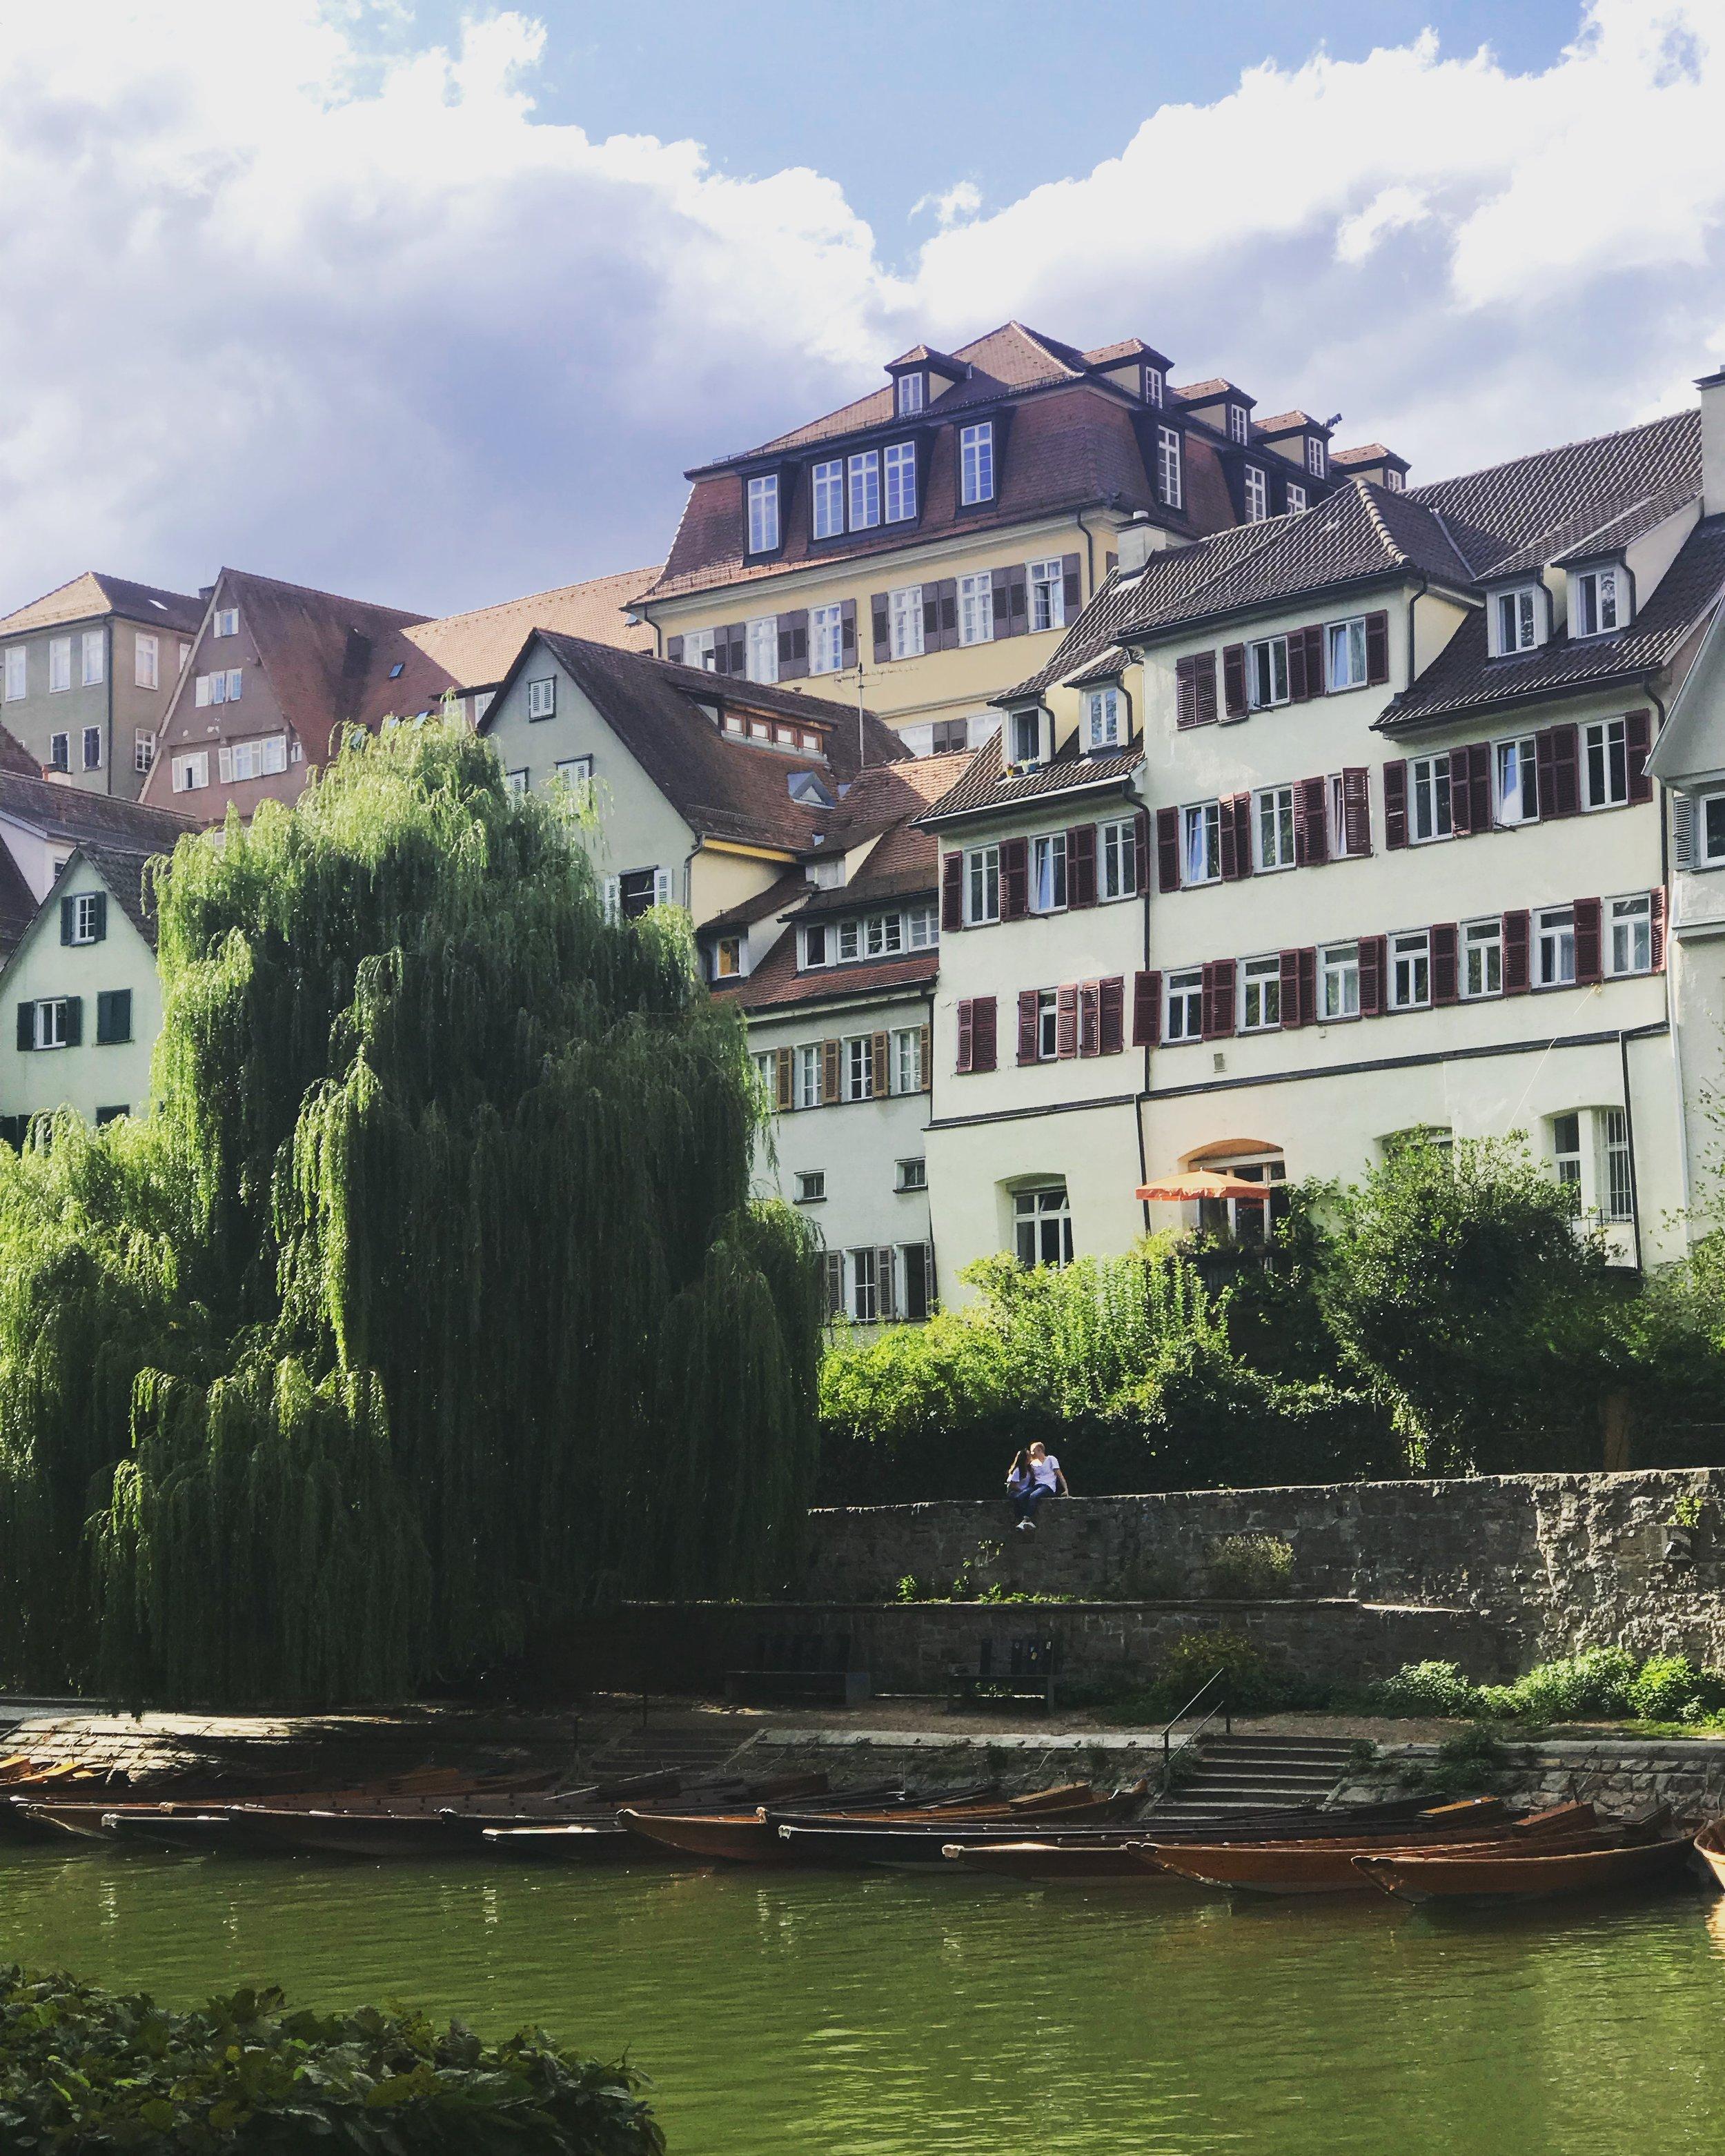 6. Neckar Island - Pack a picnic and take a nap under the trees on Neckar Island or walk the beautiful Plane Tree Avenue.